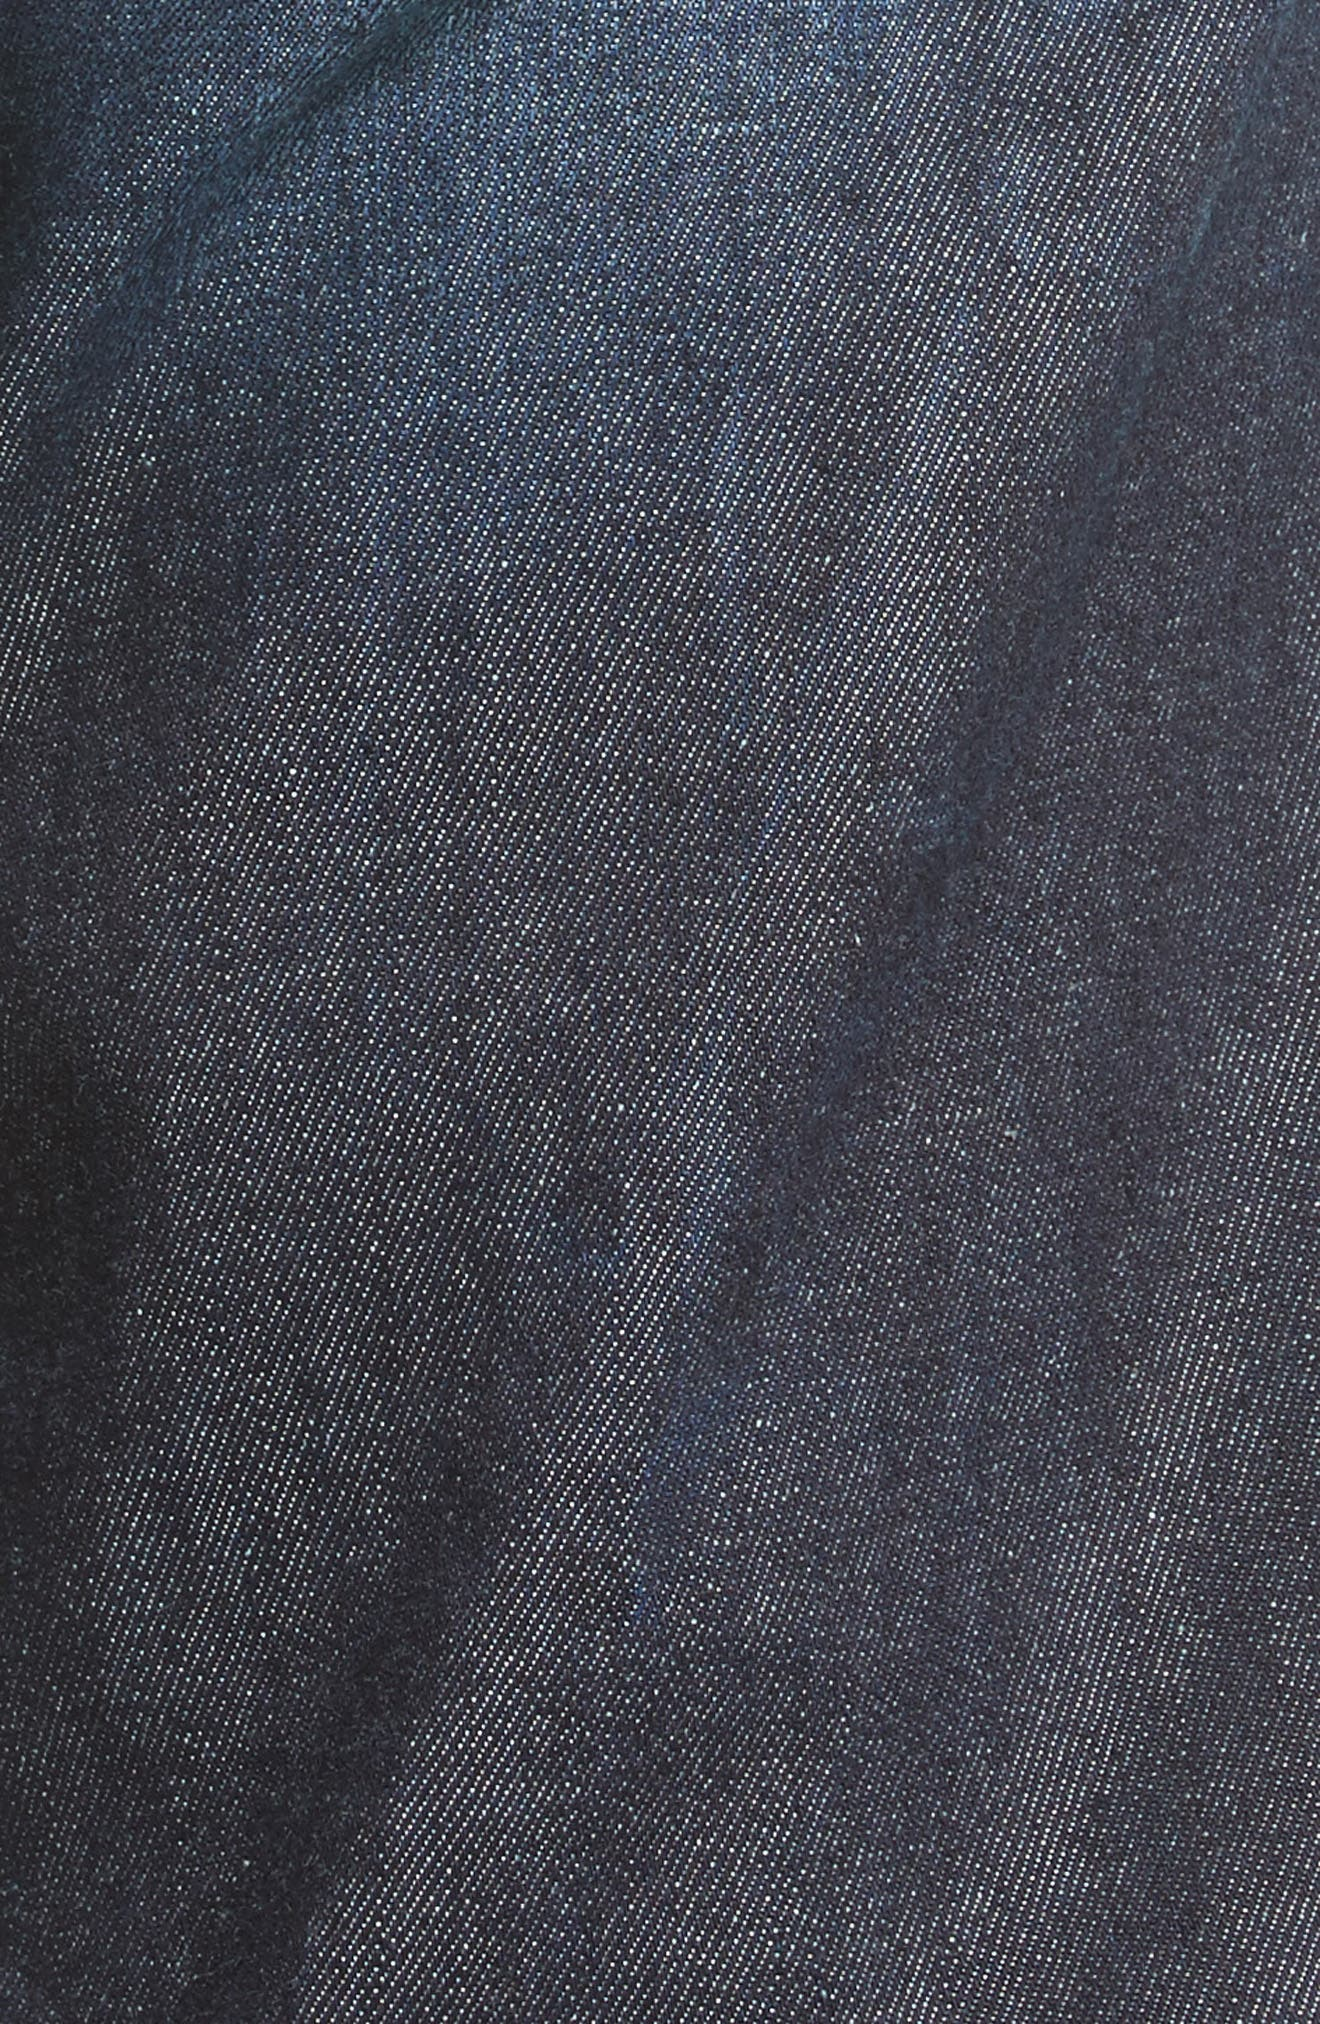 Slim Nothing Jeans,                             Alternate thumbnail 5, color,                             BLUE